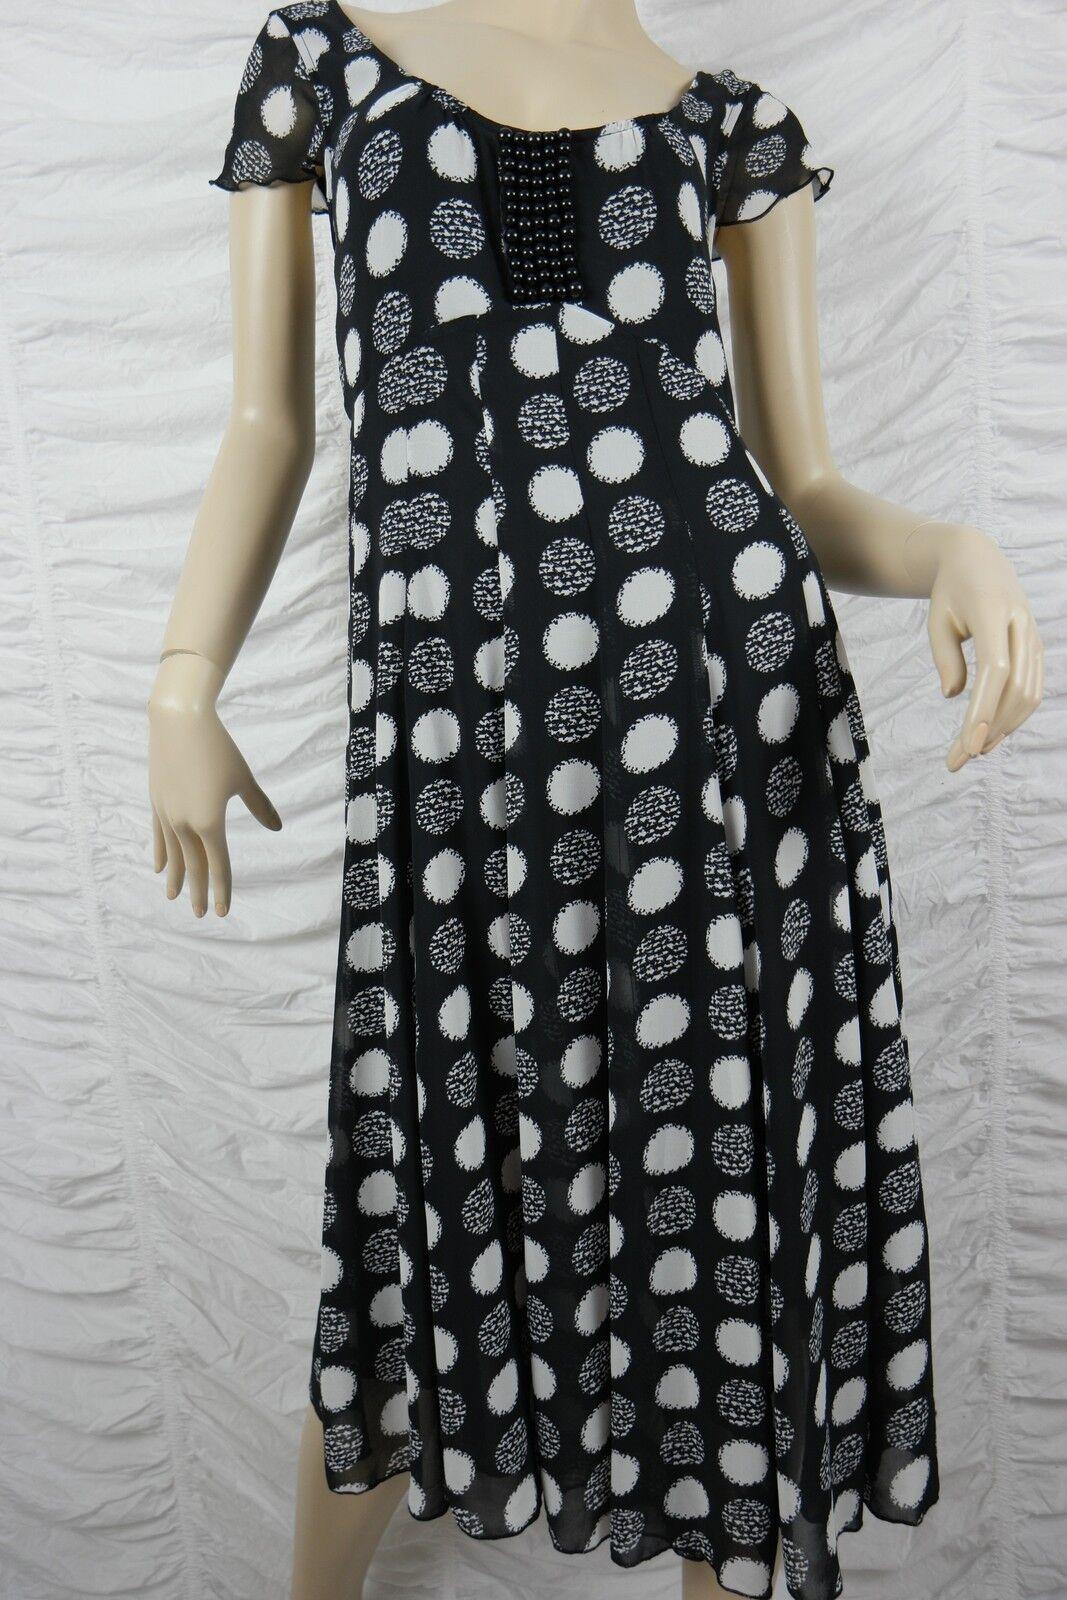 SCARLETT schwarz Weiß polka dot empire waist cap sleeve dress Größe 8 BNWT NZ